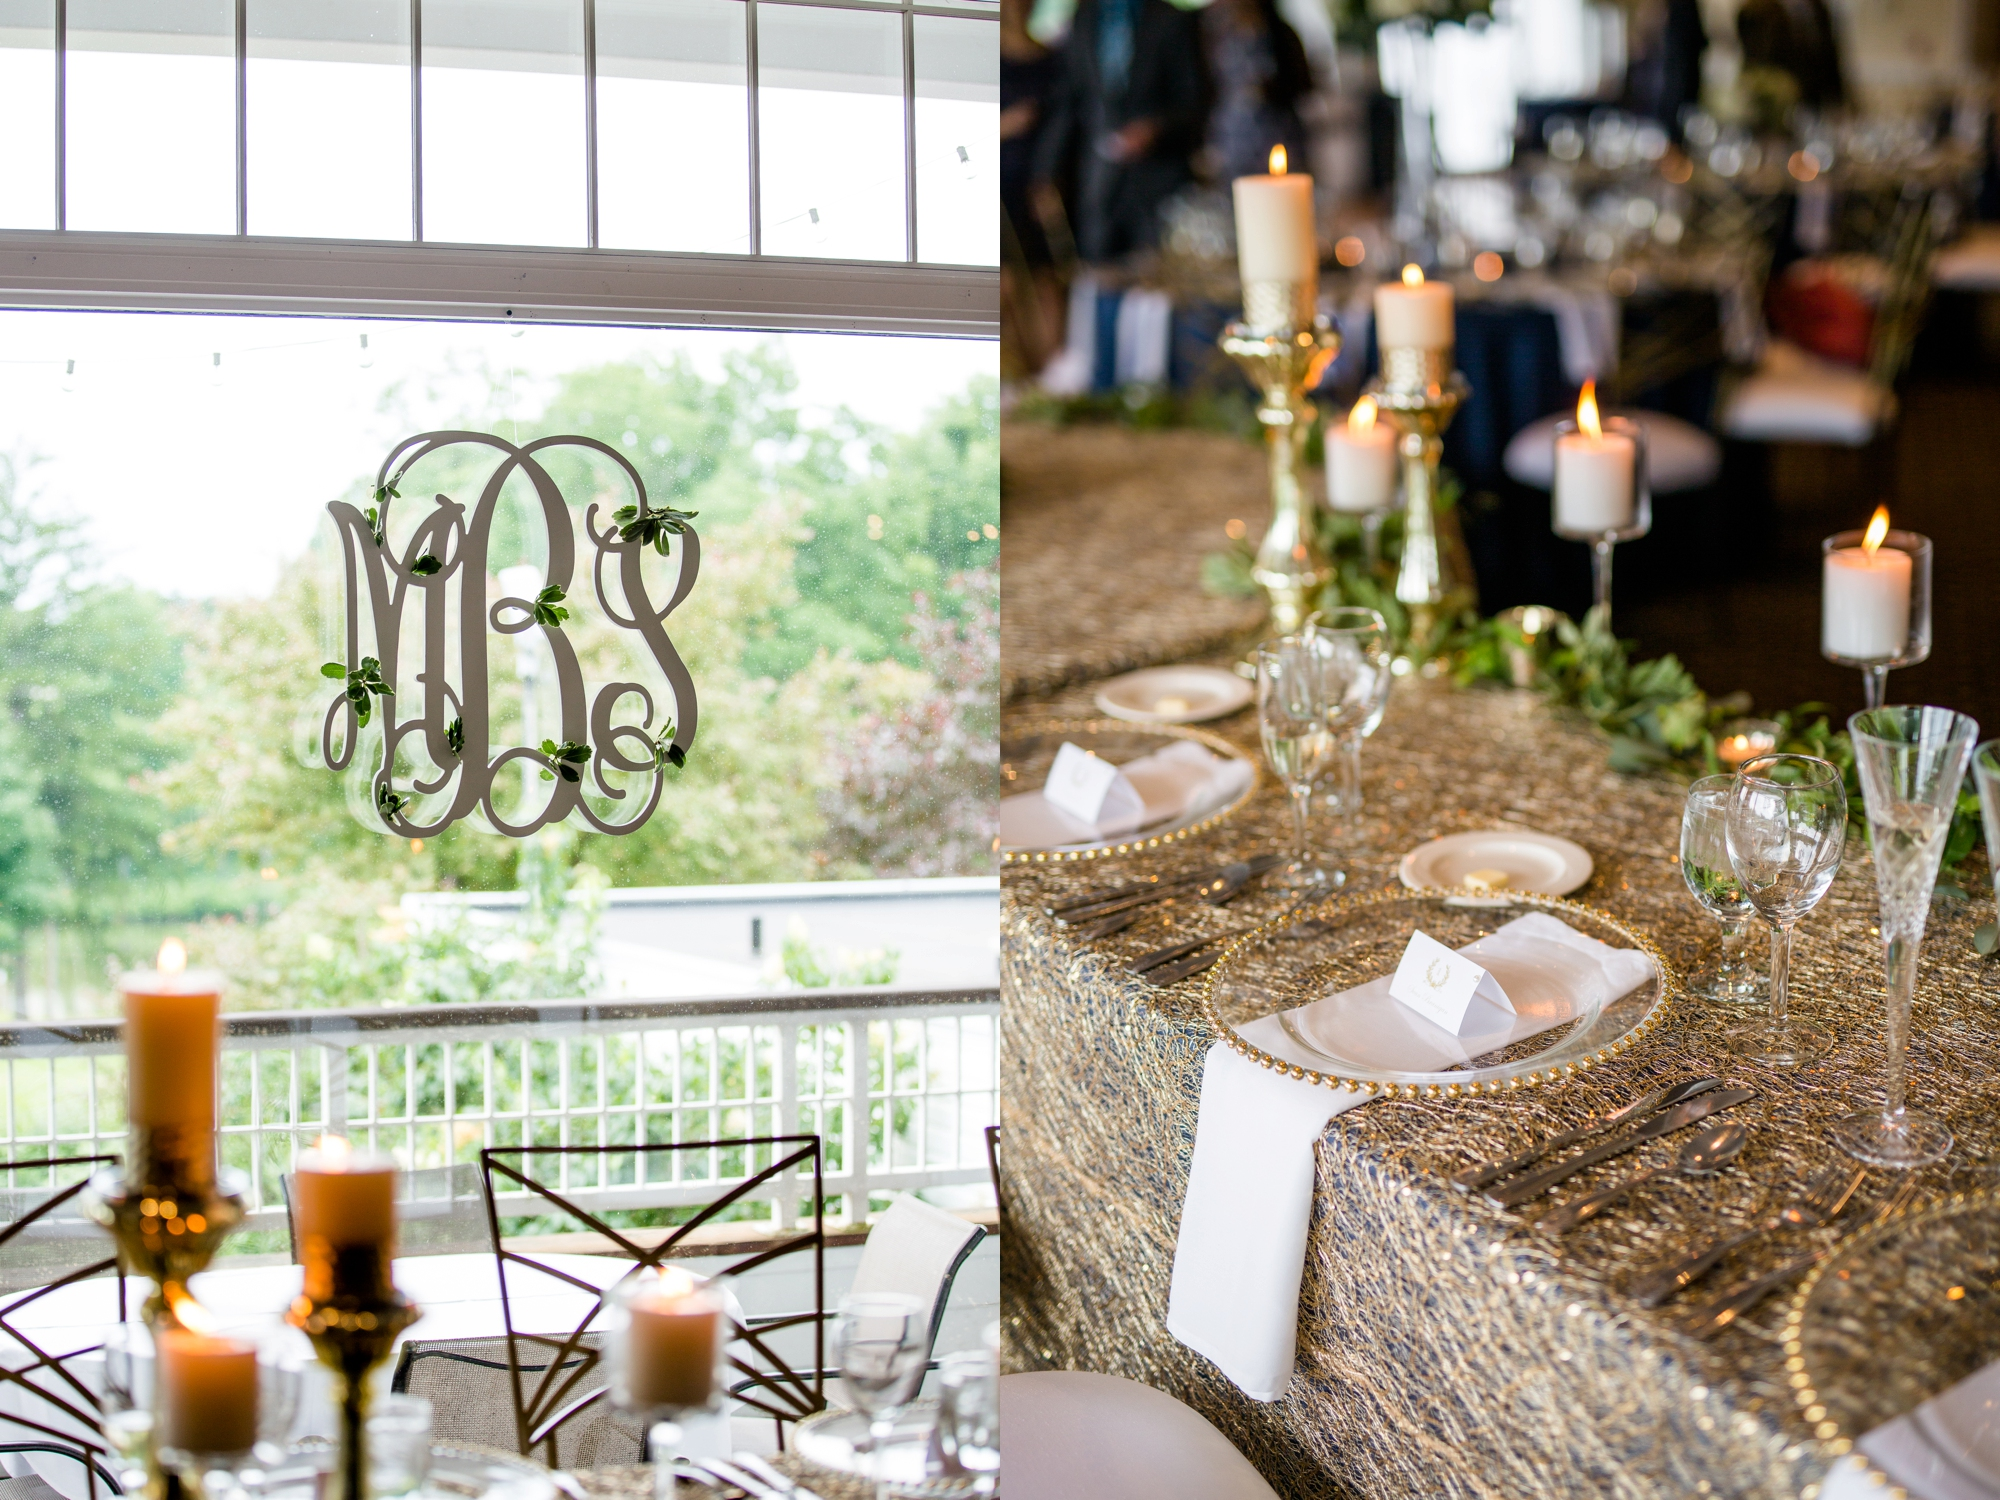 butler country club wedding photos, pittsburgh wedding photographer, butler country club wedding pictures, pittsburgh wedding venues, wedding photographers pittsburgh, pittsburgh photographers